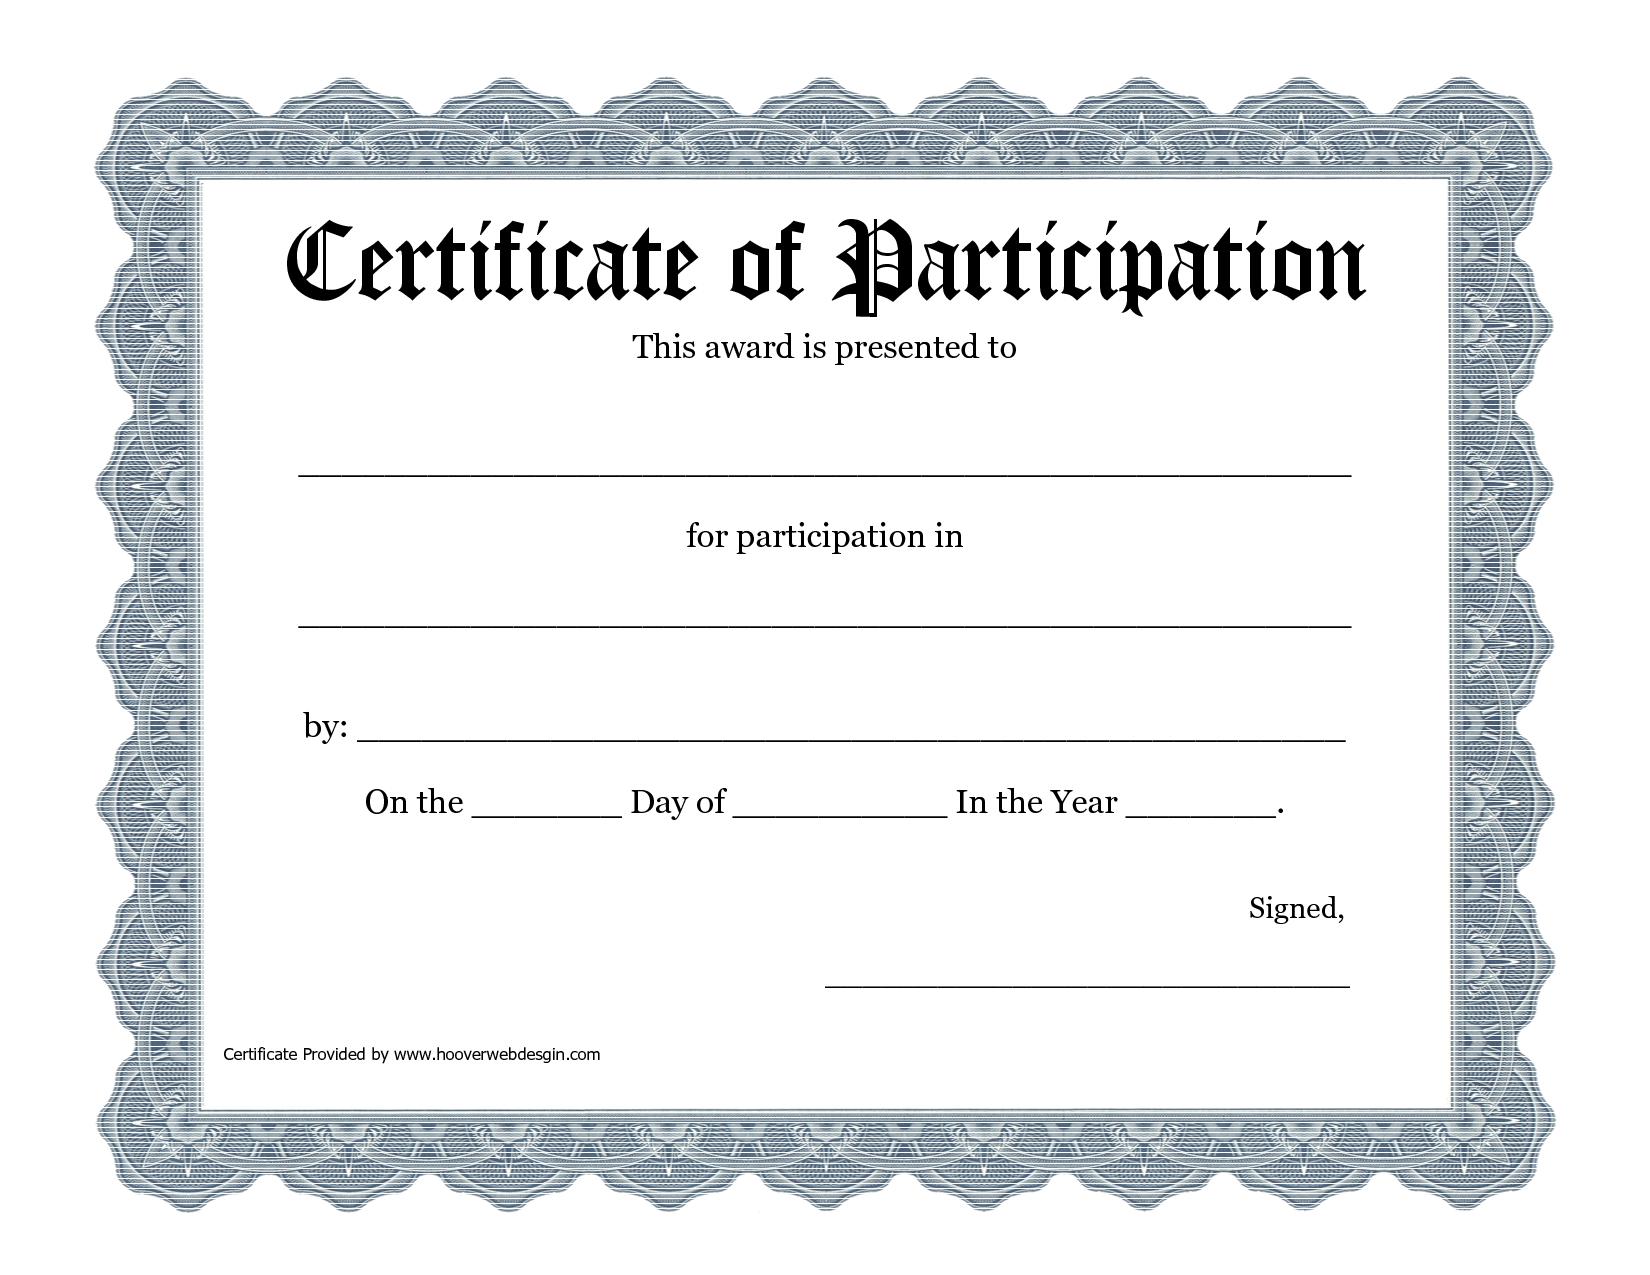 Free Printable Award Certificate Template - Bing Images | 2016 Art - Free Printable Certificate Templates